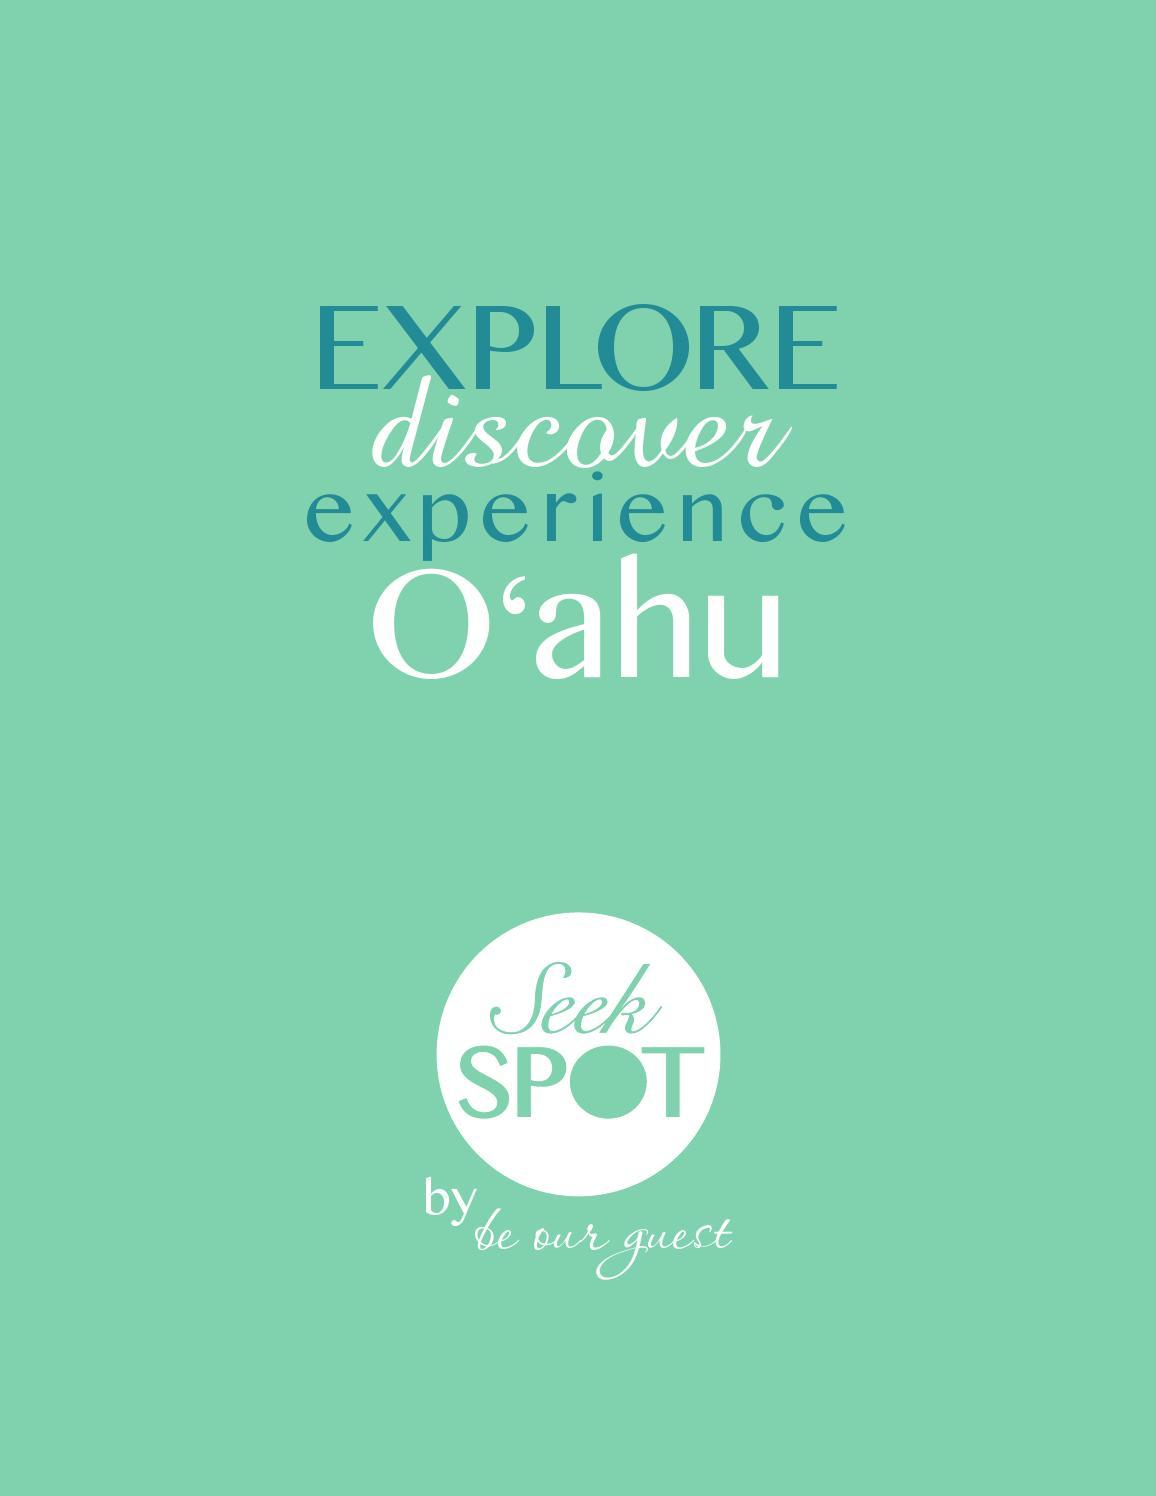 Seekspot 2015 Oahu Guide Book by Seek Spot Guide to Oahu - issuu